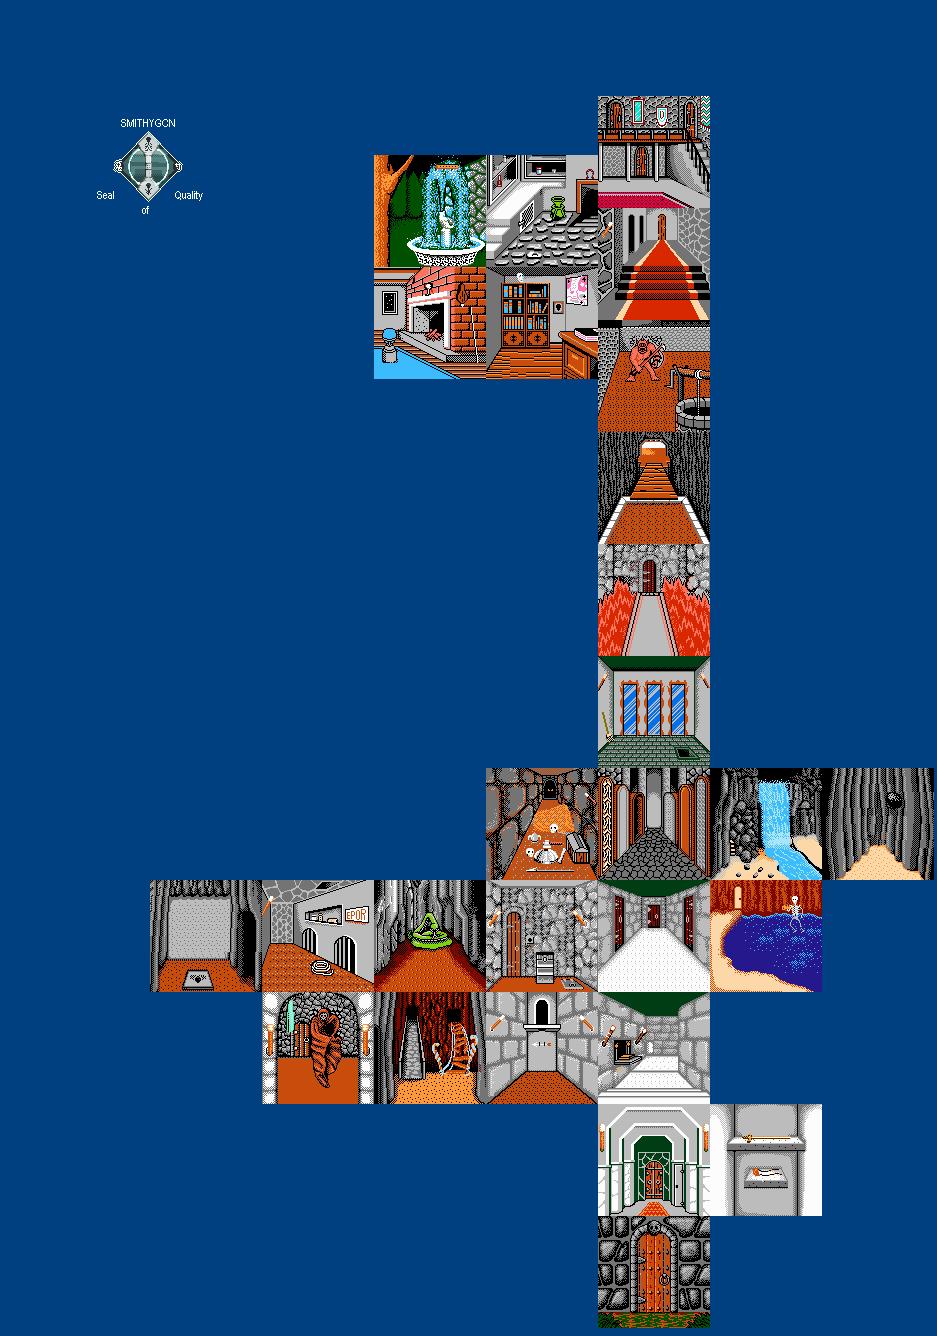 Deja Vu Review for NES (1990) - Defunct Games